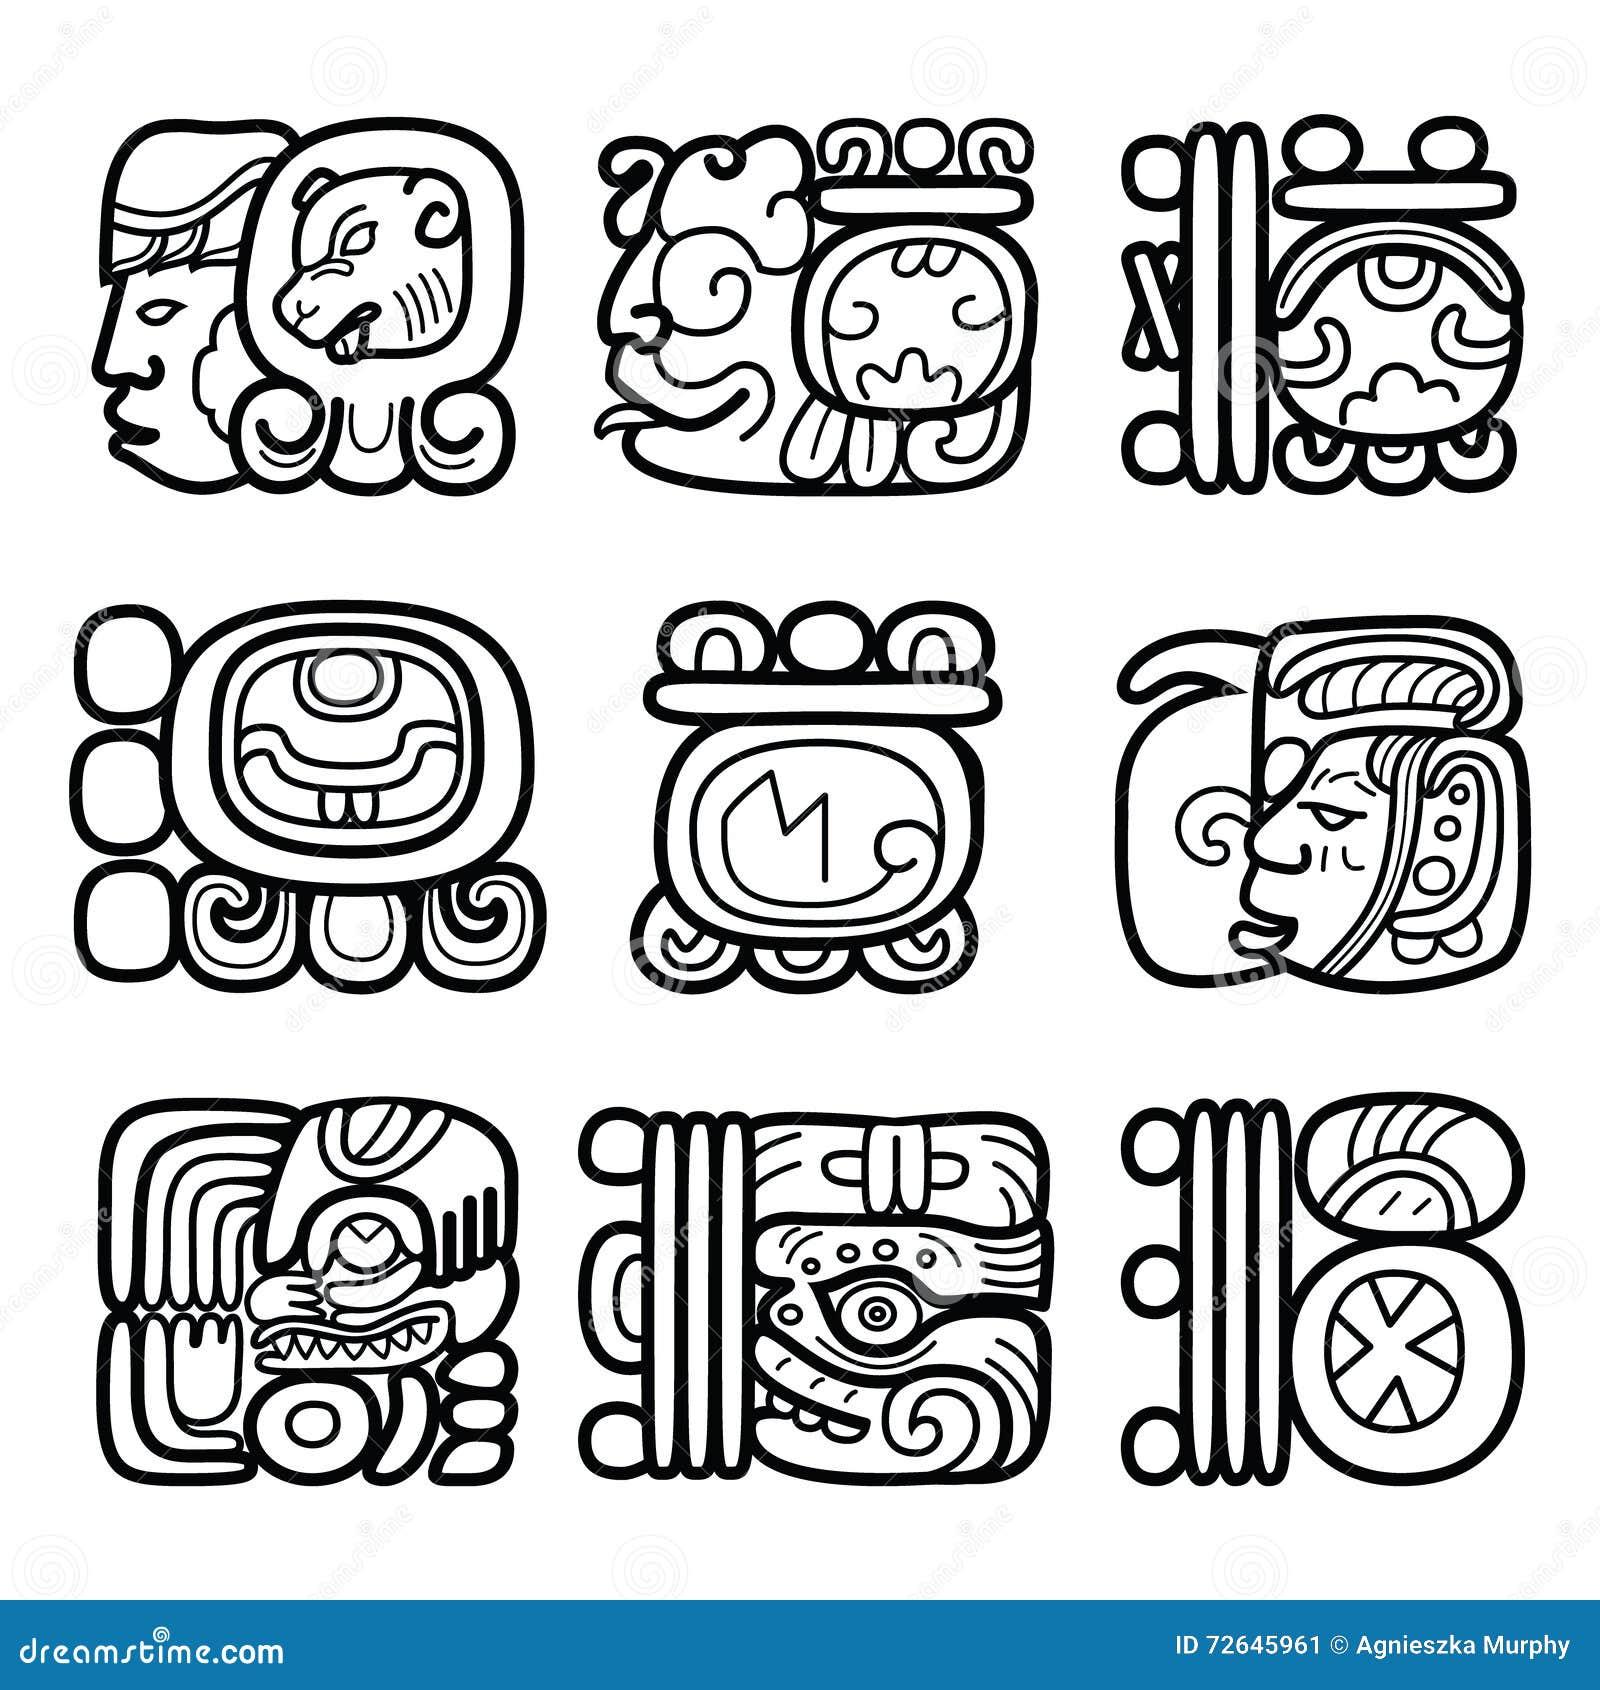 Maya hieroglyphic writing an introduction for an essay